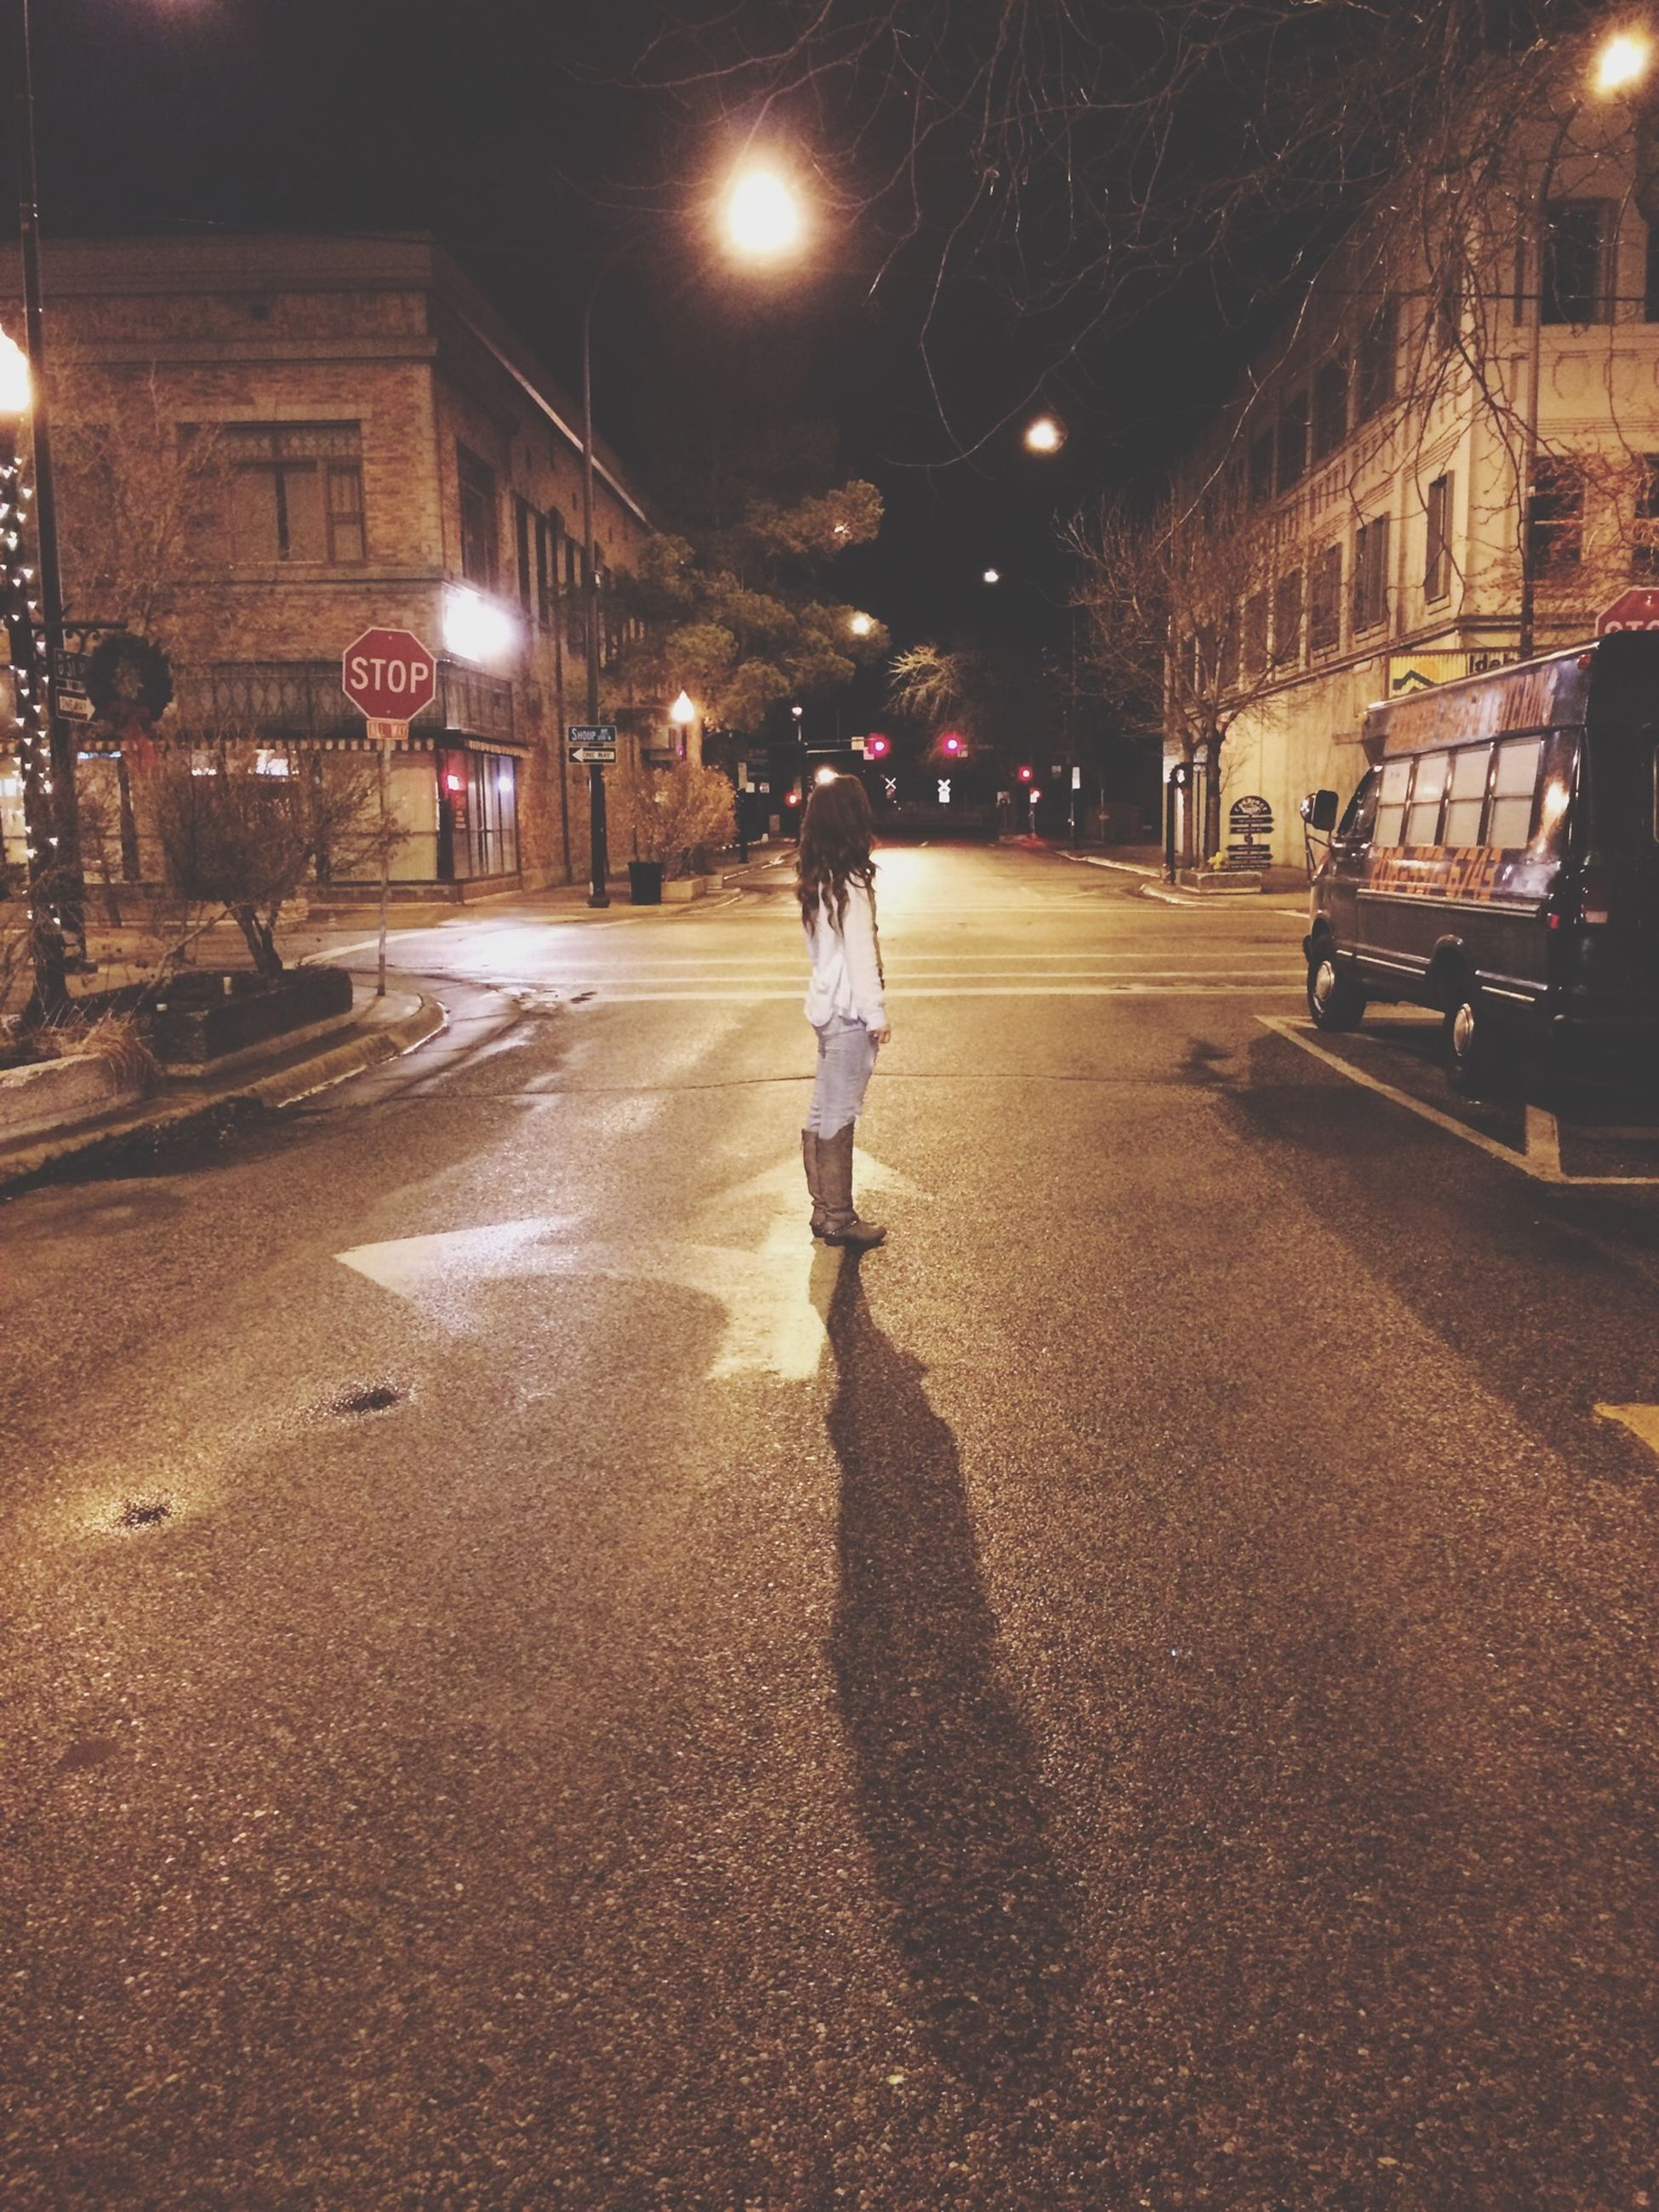 night, illuminated, street, full length, building exterior, lifestyles, walking, city, built structure, architecture, leisure activity, street light, men, city life, rear view, transportation, road, land vehicle